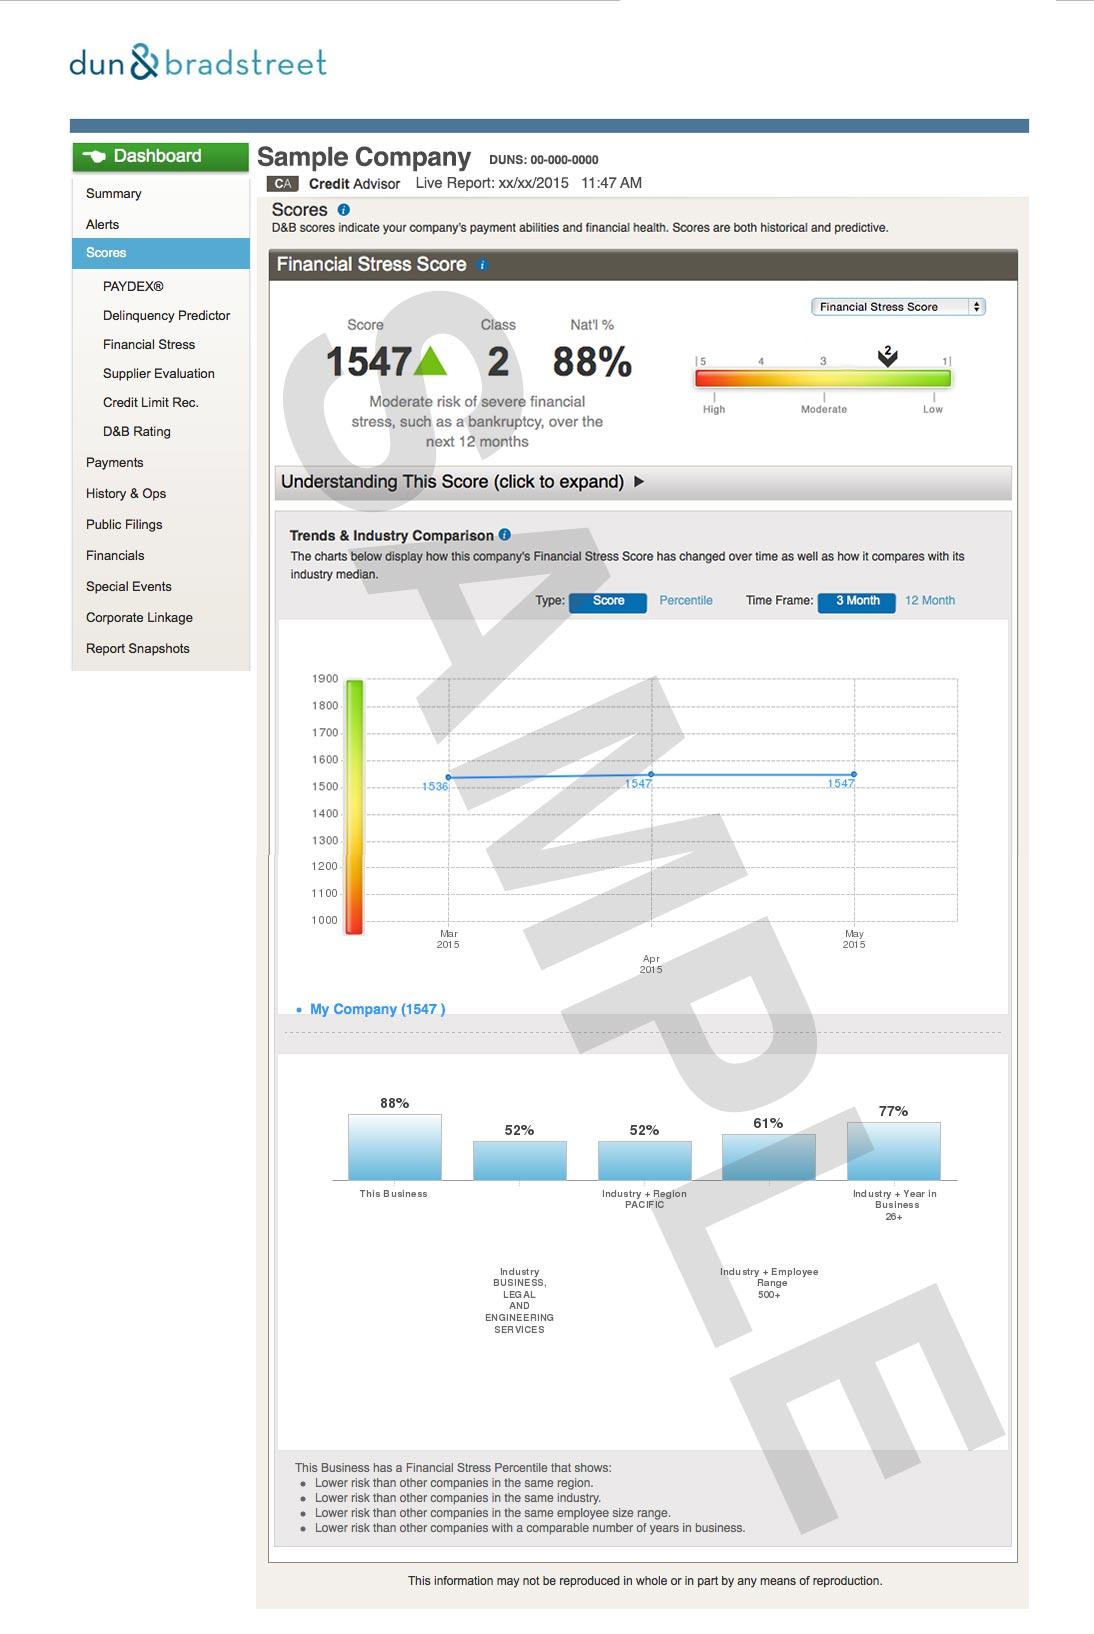 creditadvisor-sample-reportB_REV2